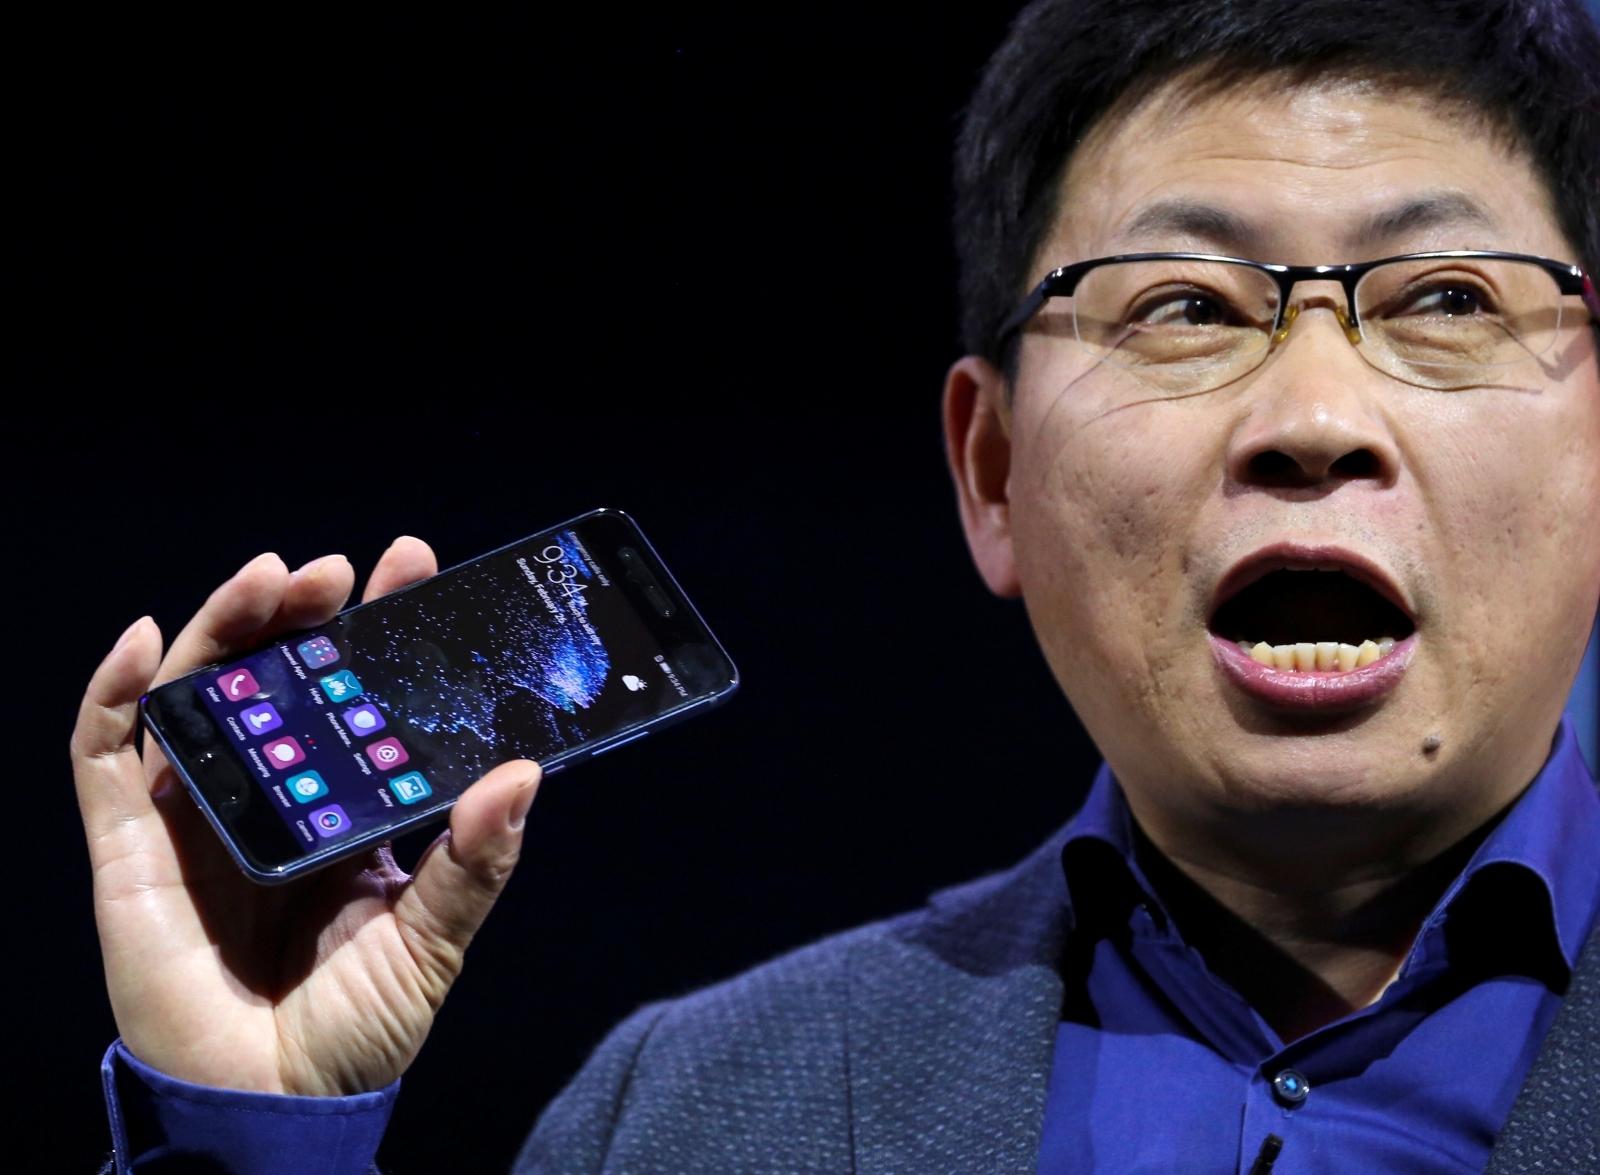 Huawei's consumer business chief executive Richard Yu